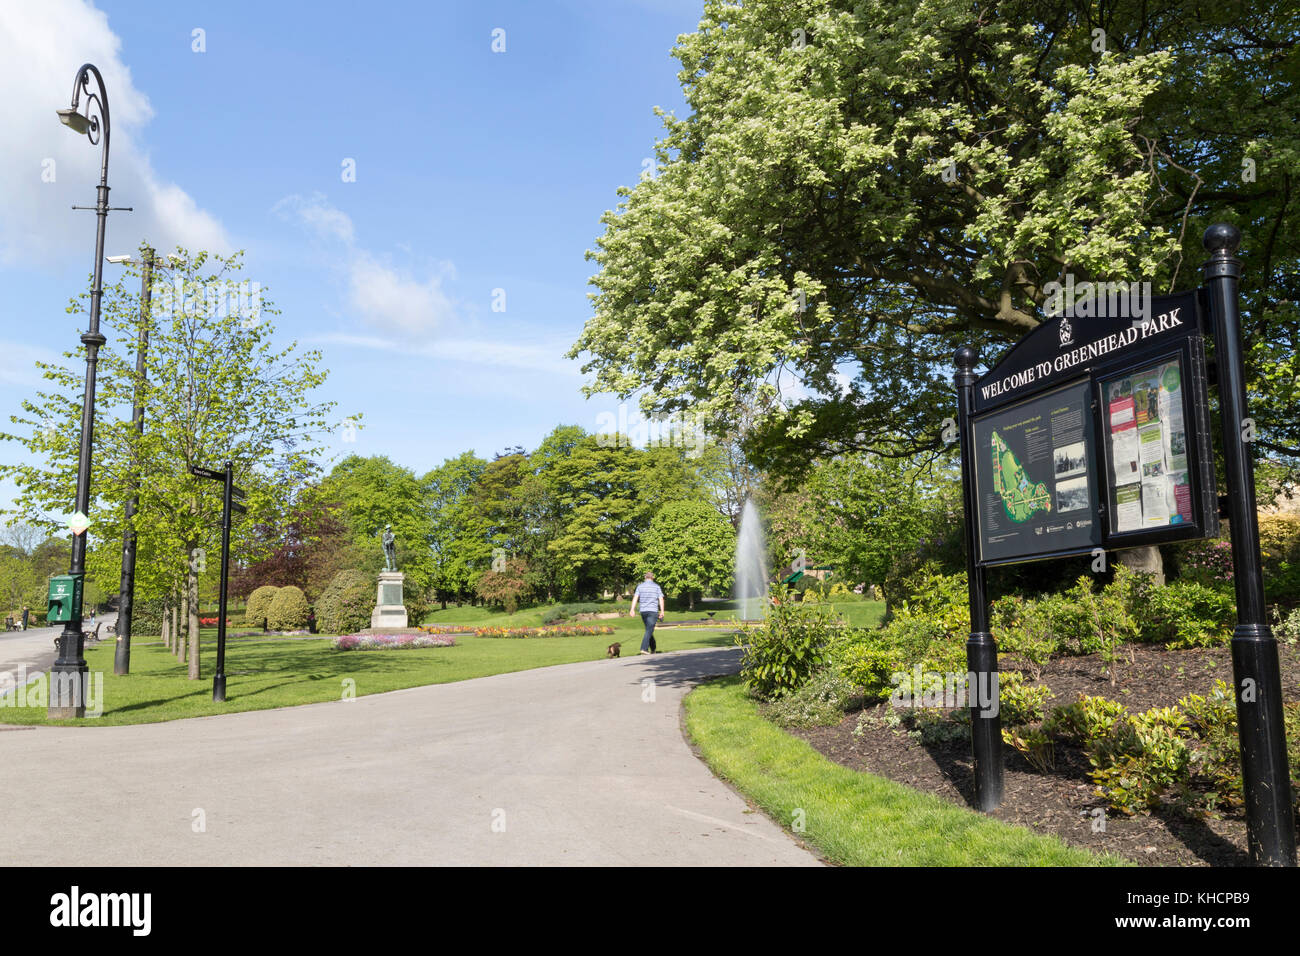 Greenhead park, Huddersfield. - Stock Image